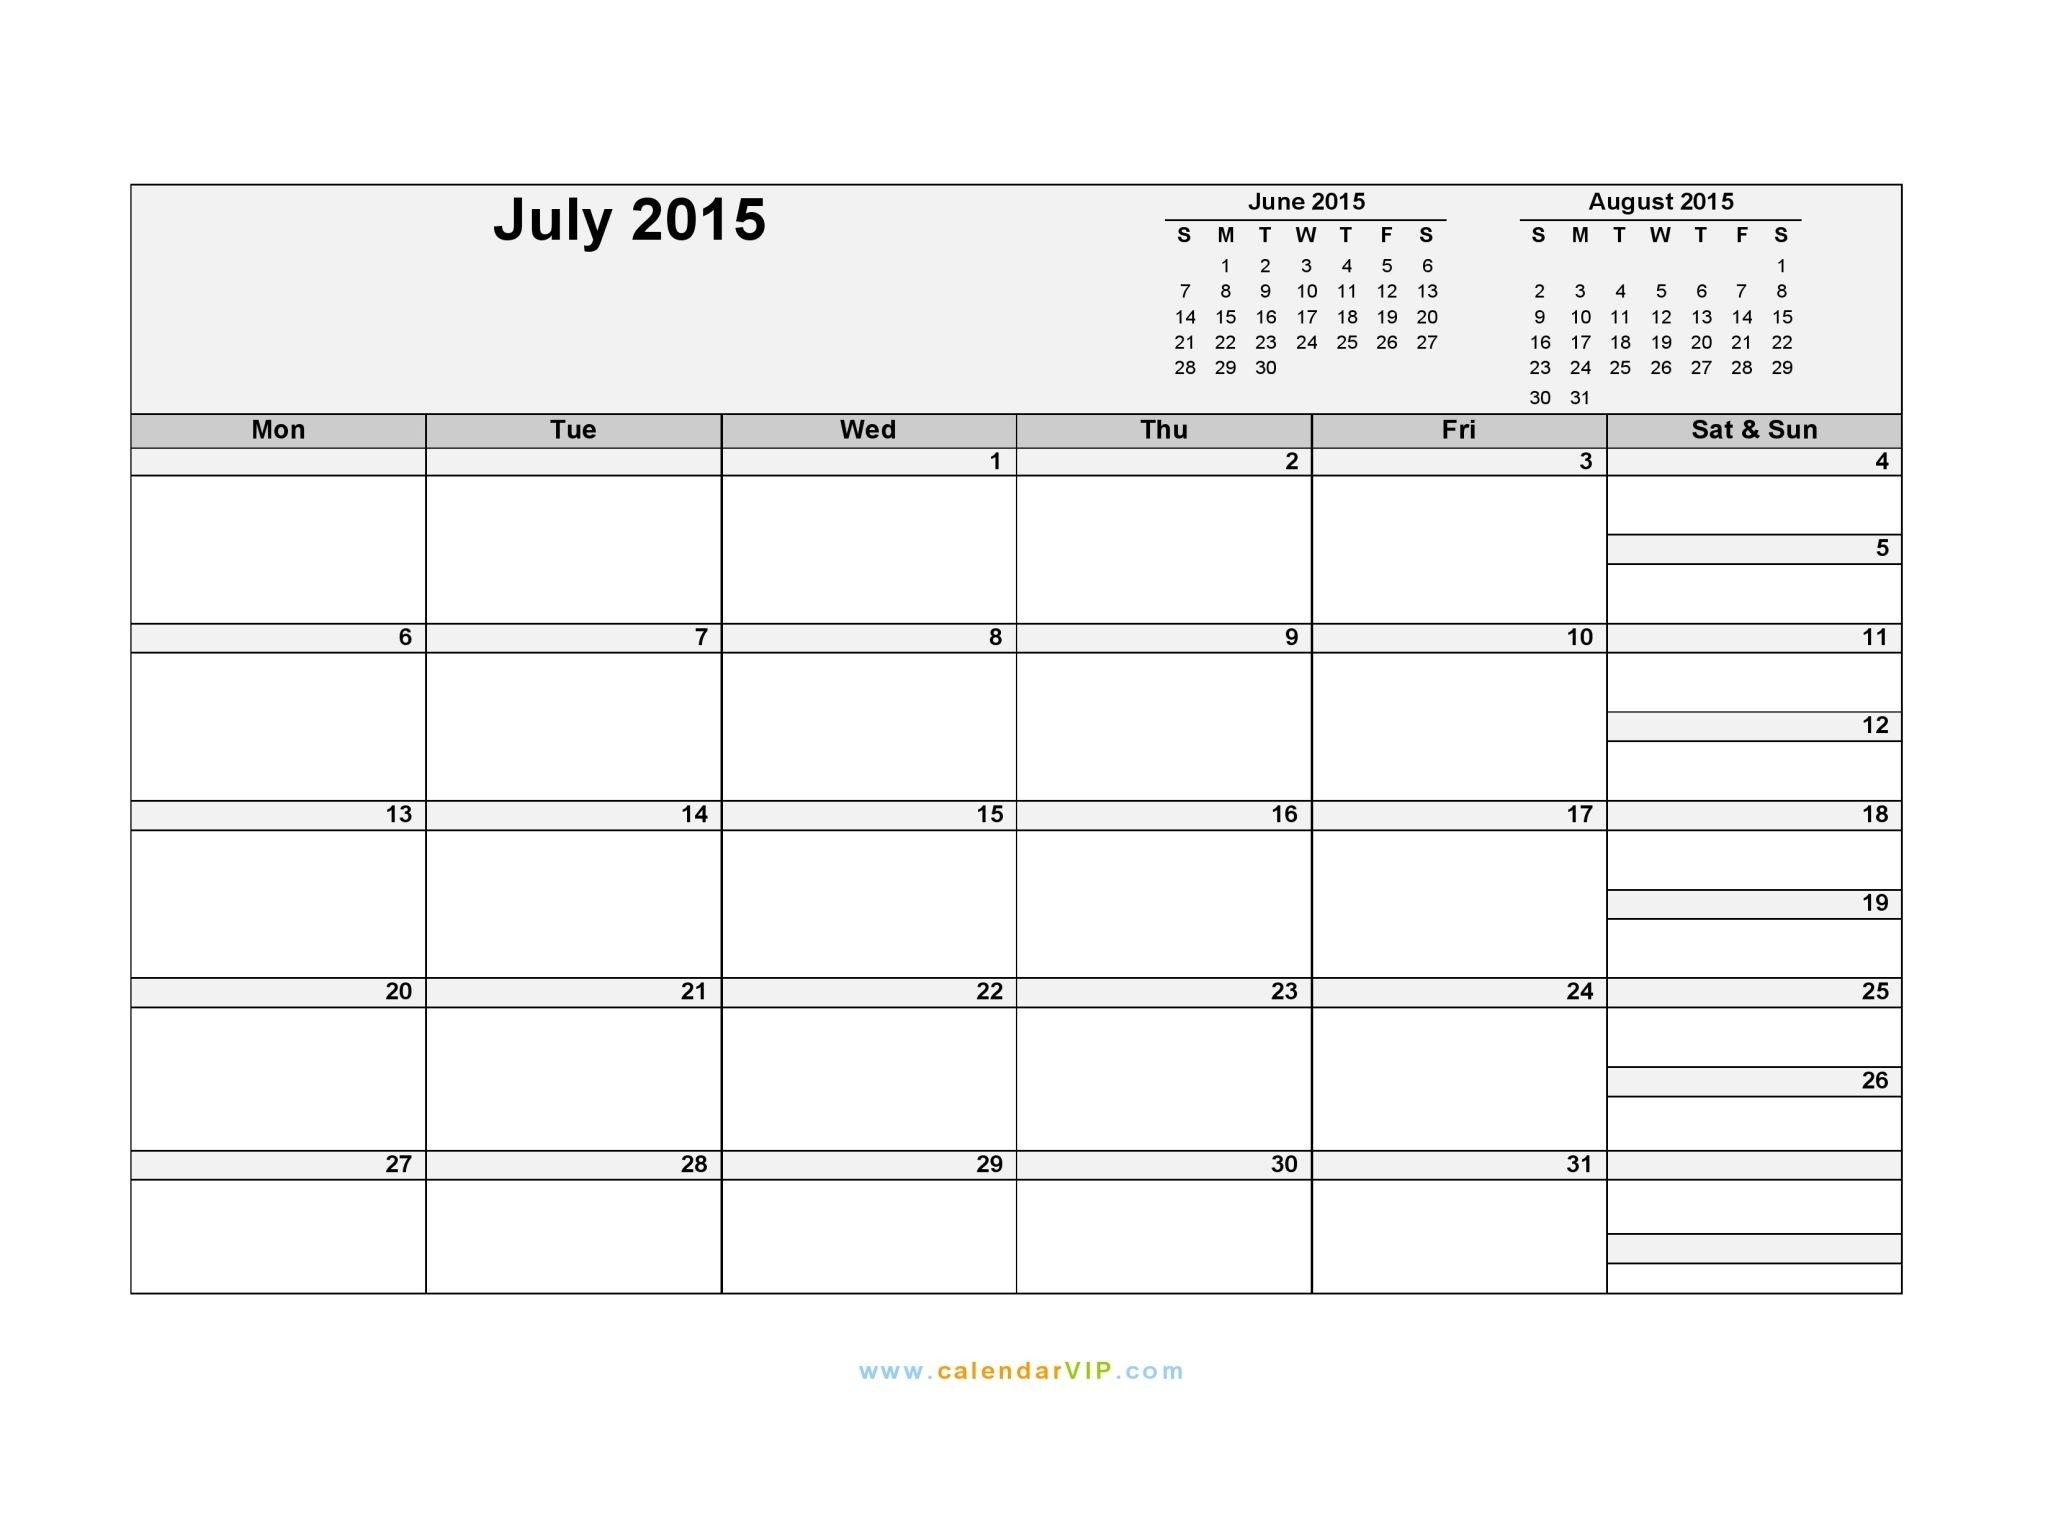 July 2015 Calendar - Blank Printable Calendar Template In